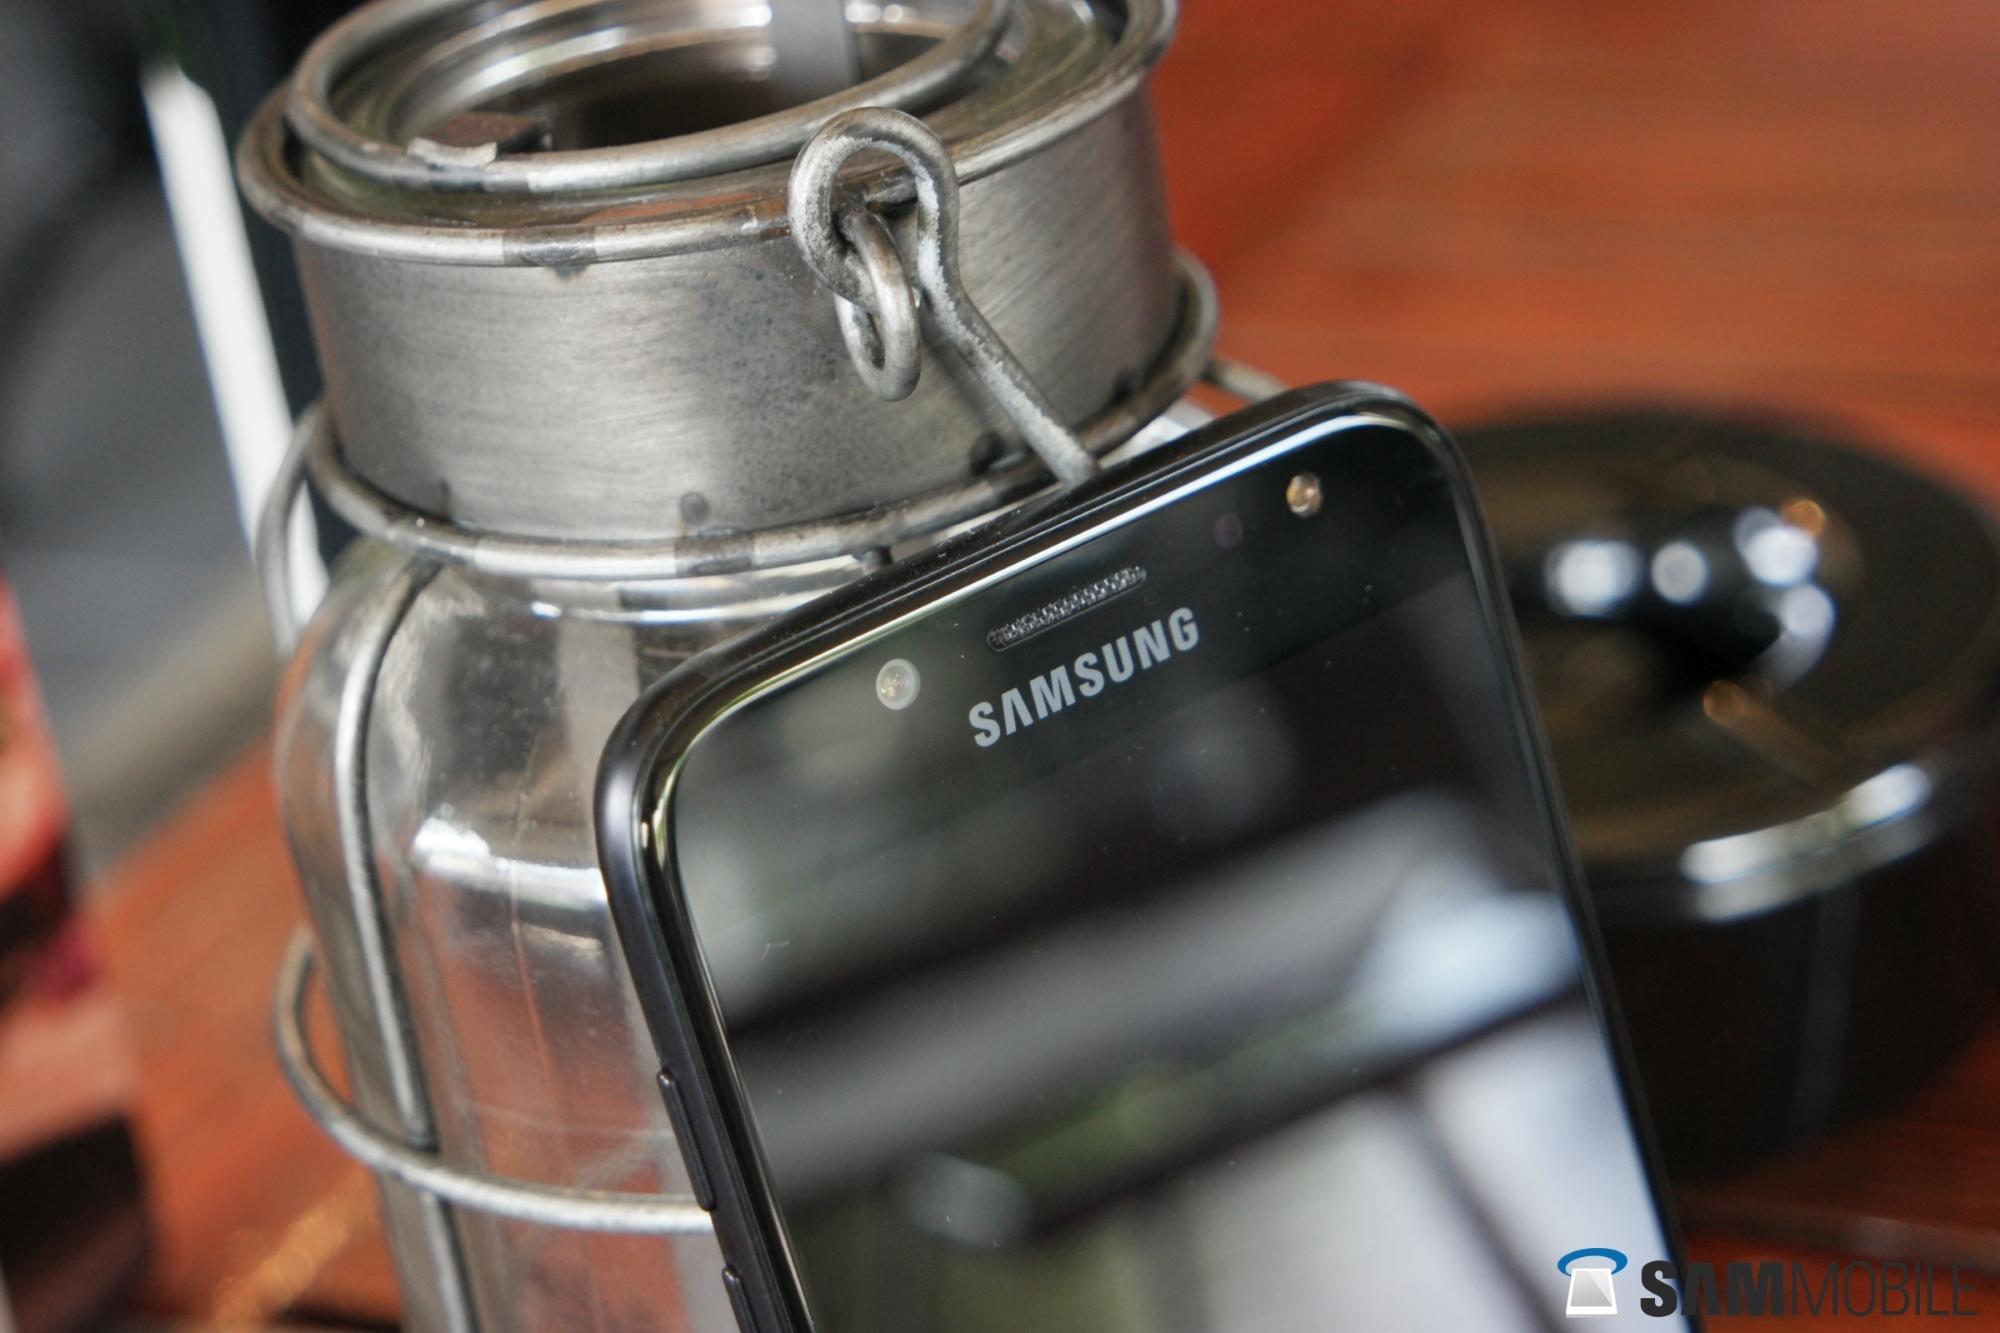 FOXWEAR 9 Brand 16G/32G Camera Watch USB HD720 Video Recording Quartz Watch IPX7 Waterproof Led